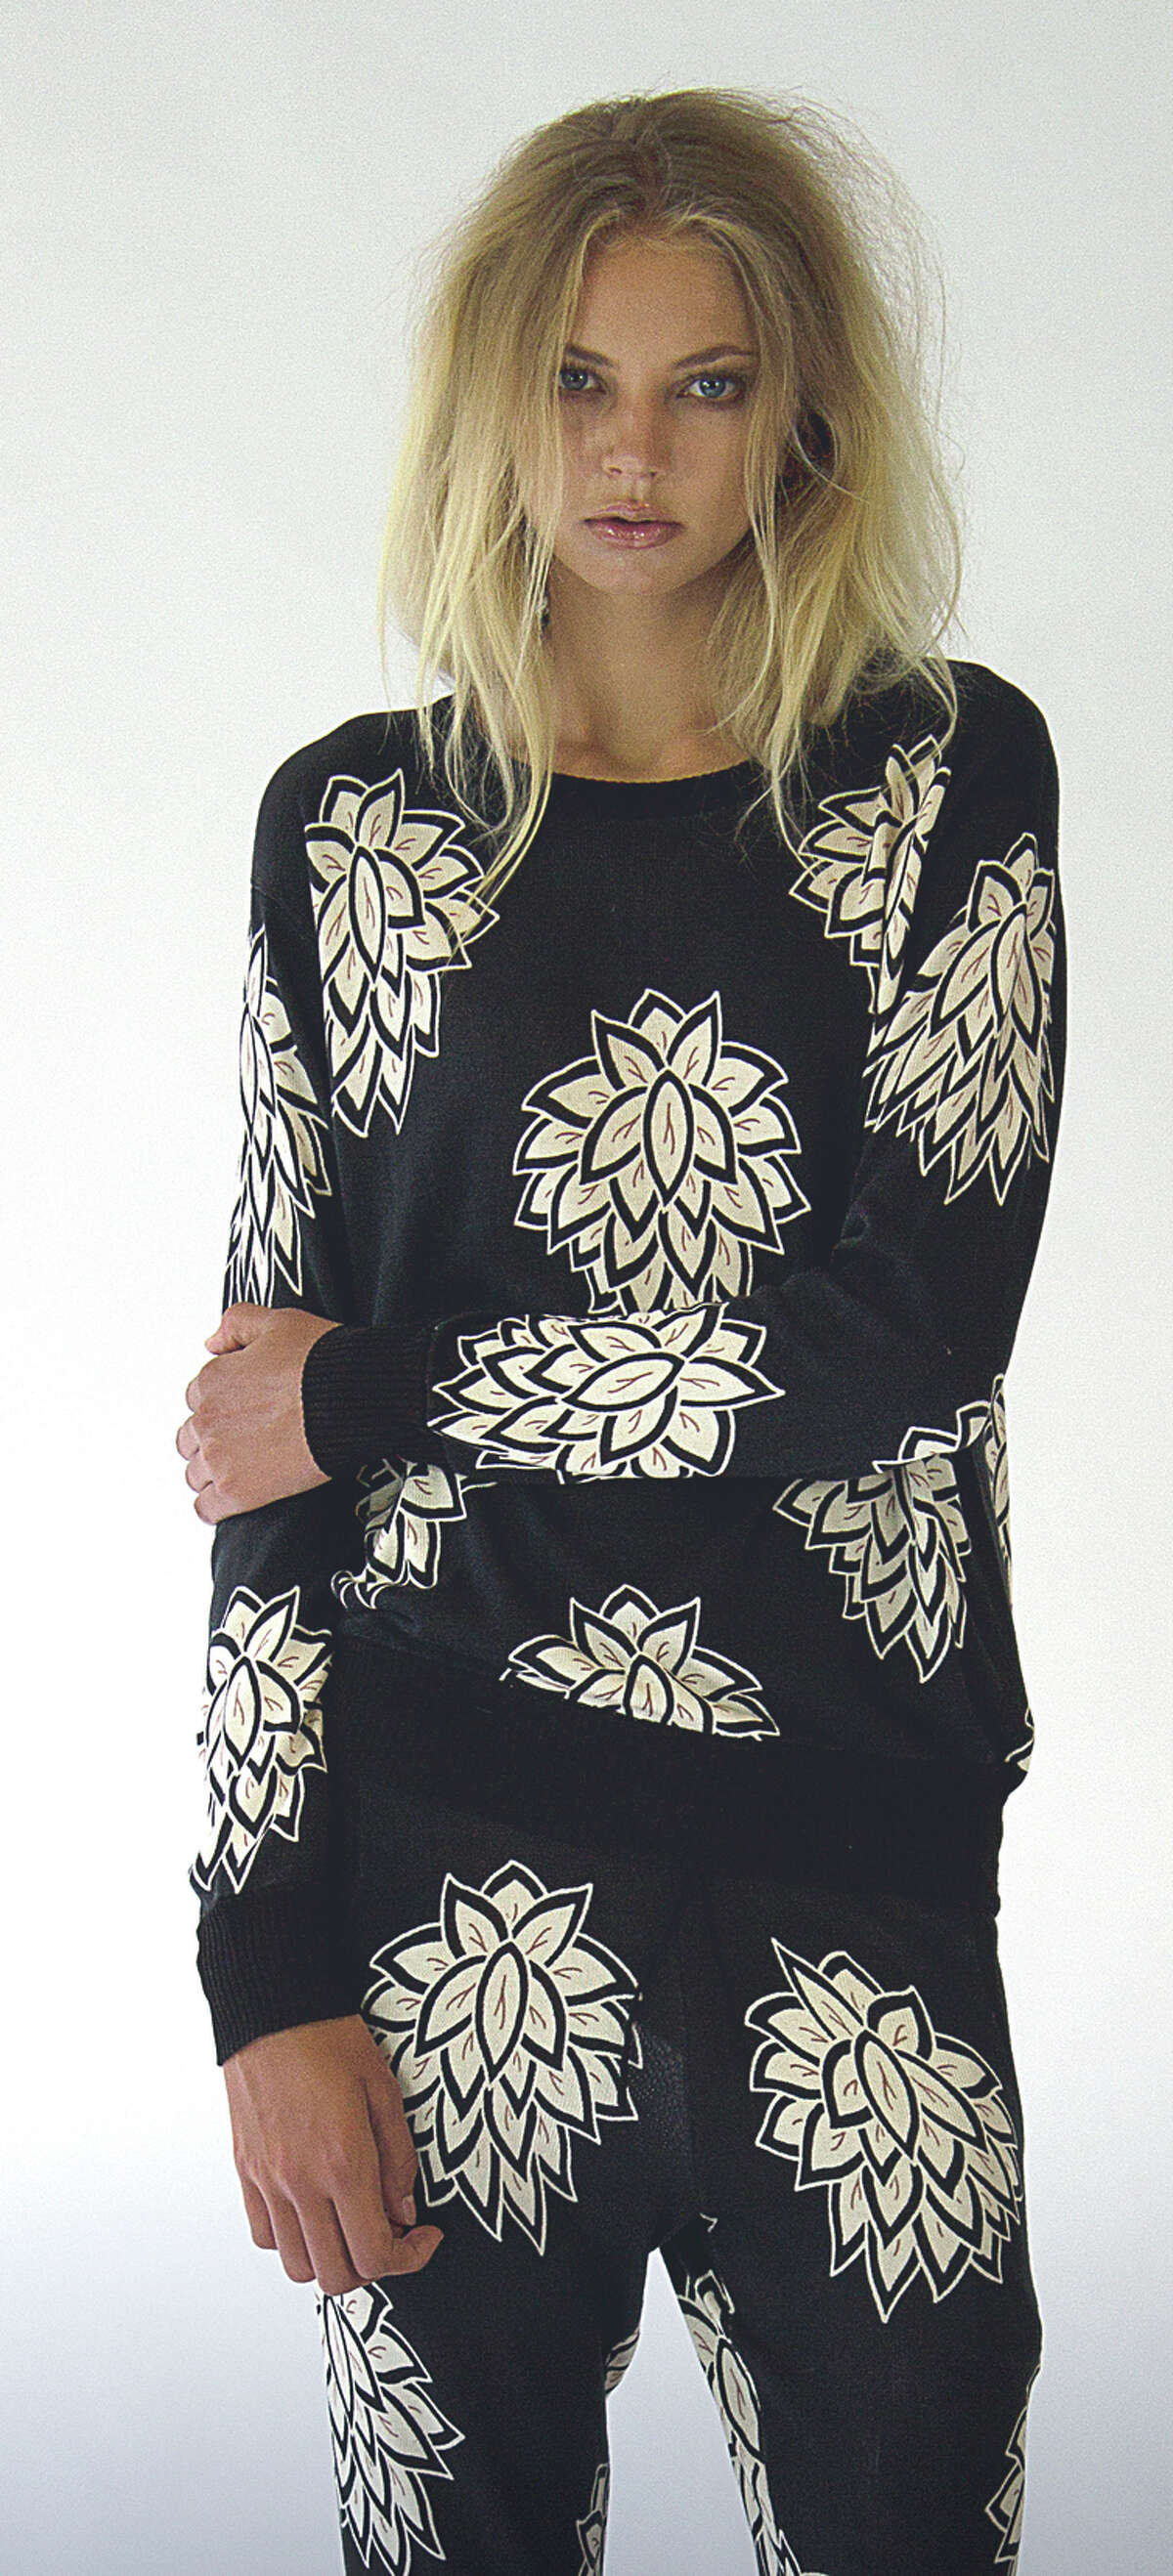 San Francisco designer Kathryn McCarron's spring collection. Elin printed floral pants, $420, and Kaye pullover, $475.